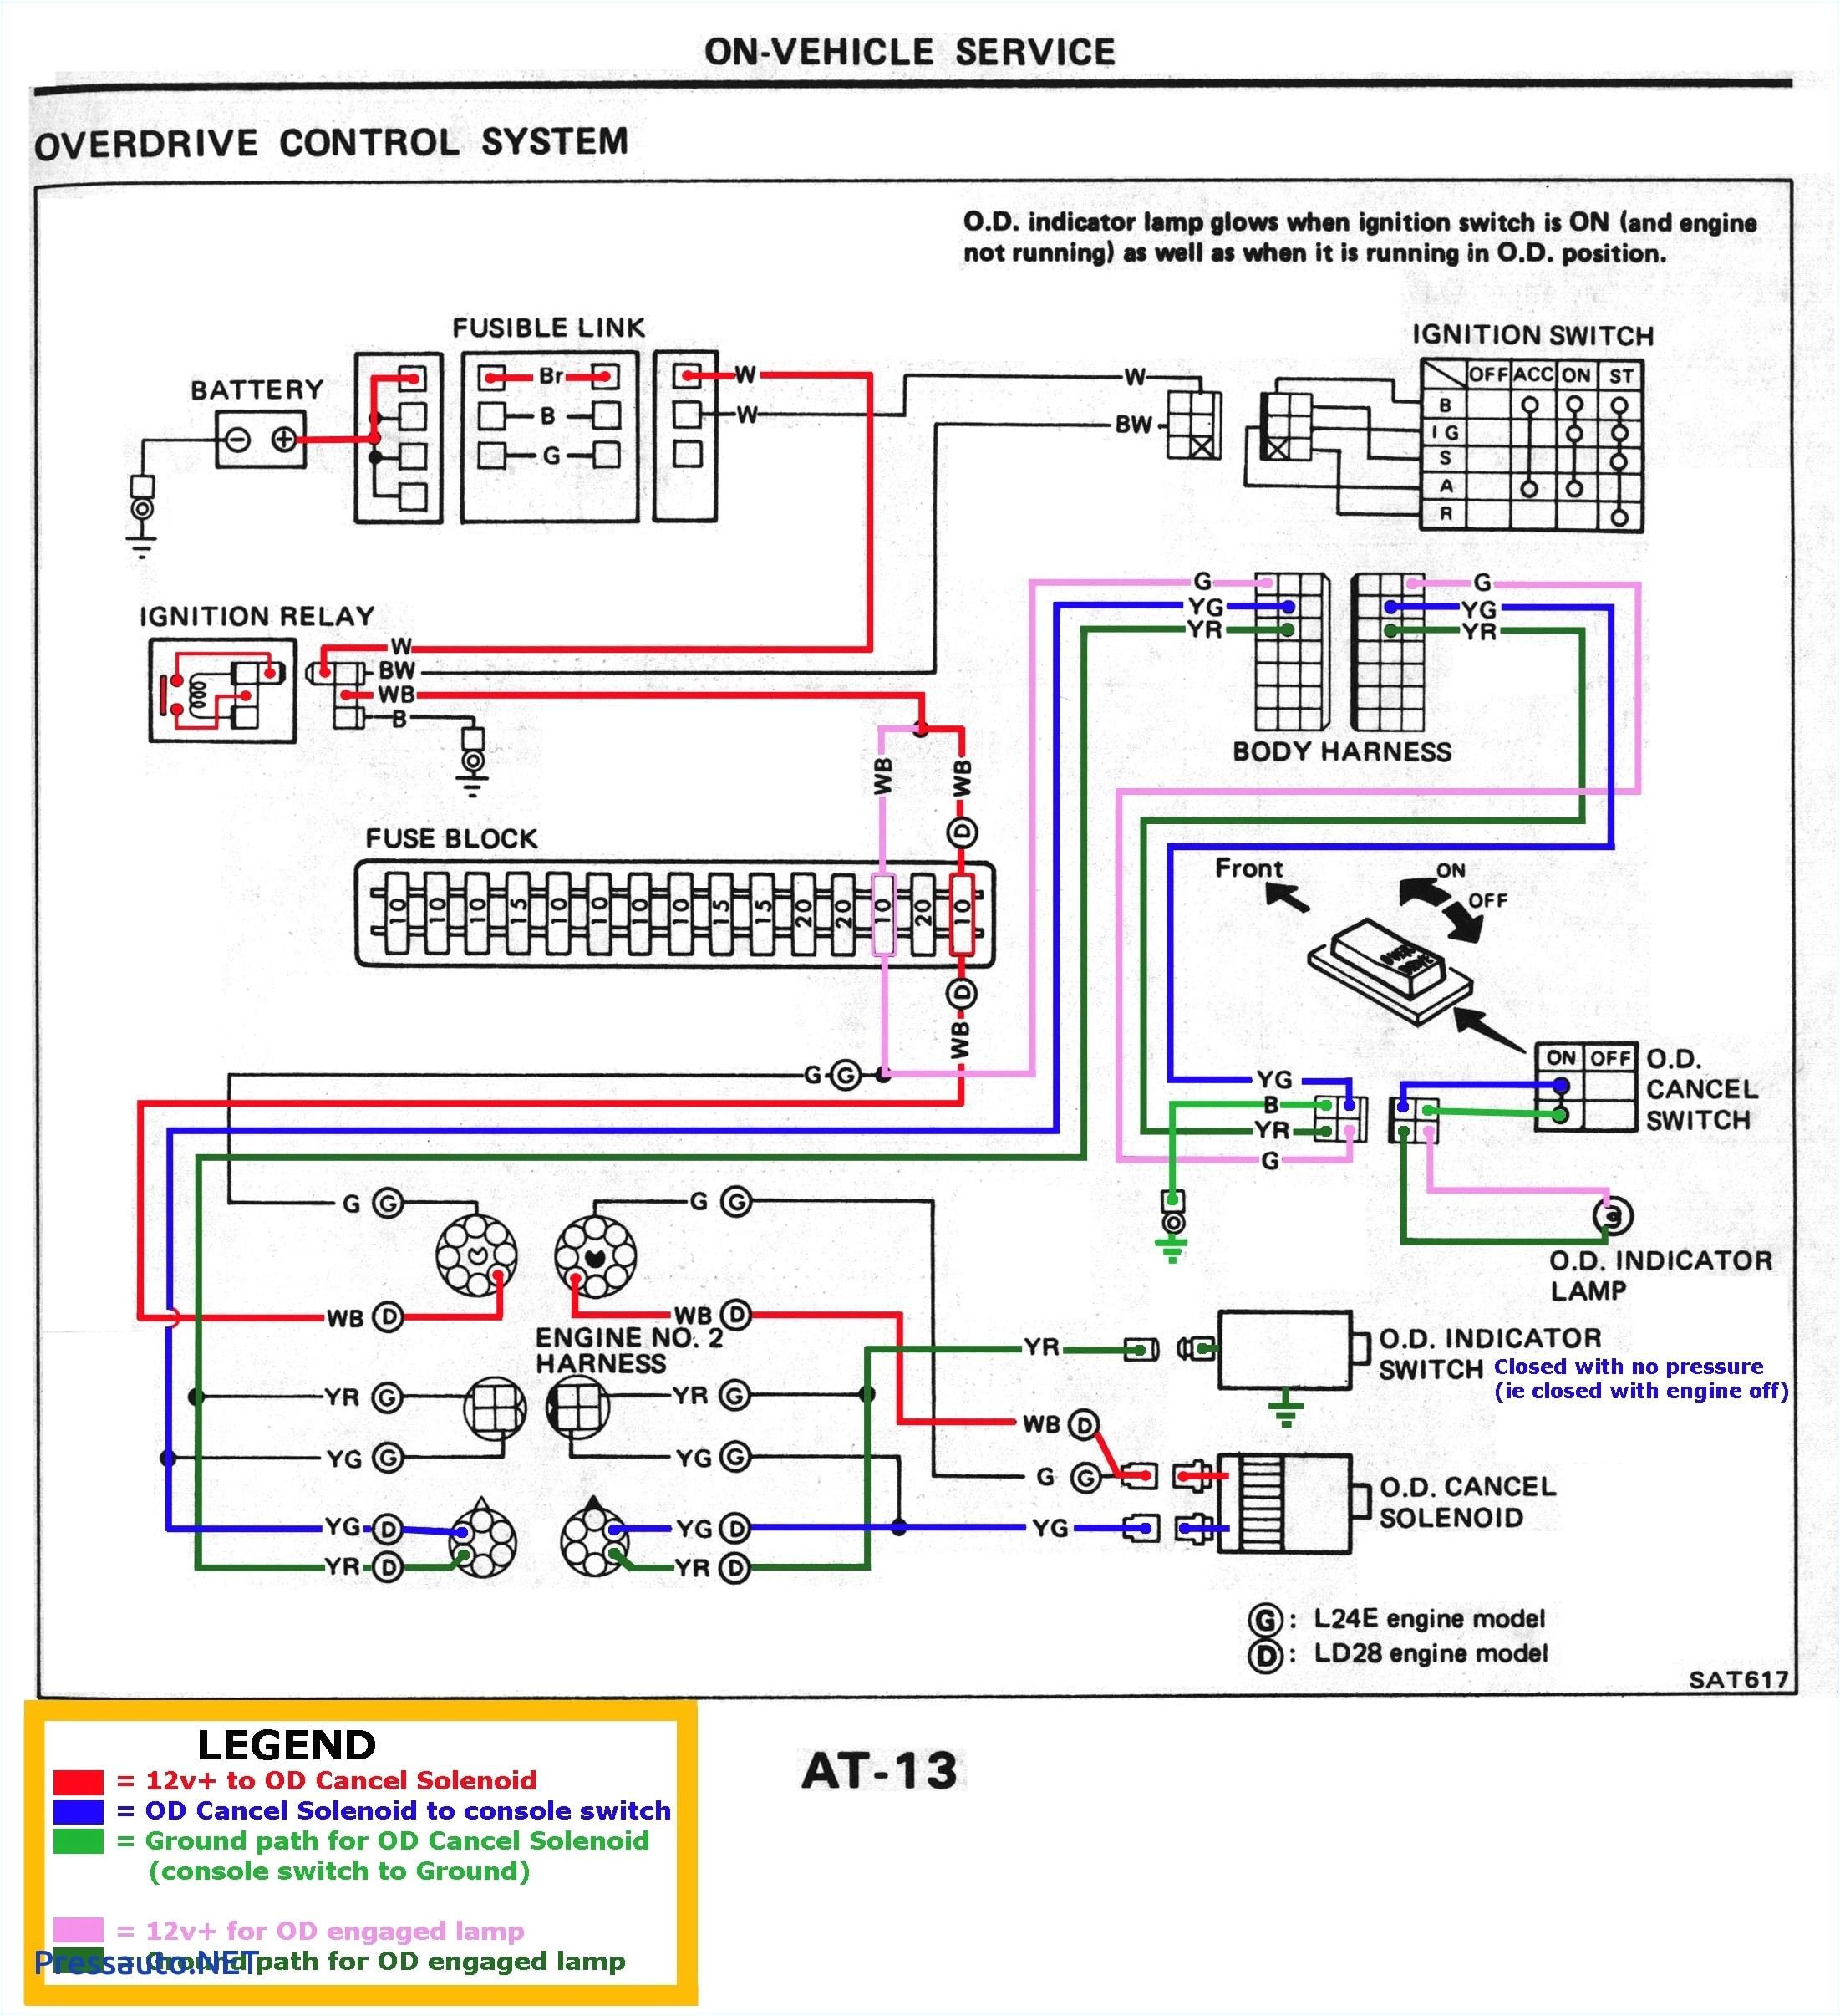 Xbox 360 Power Supply Wiring Diagram Wiring Diagram Xbox 360 Schema Diagram Database